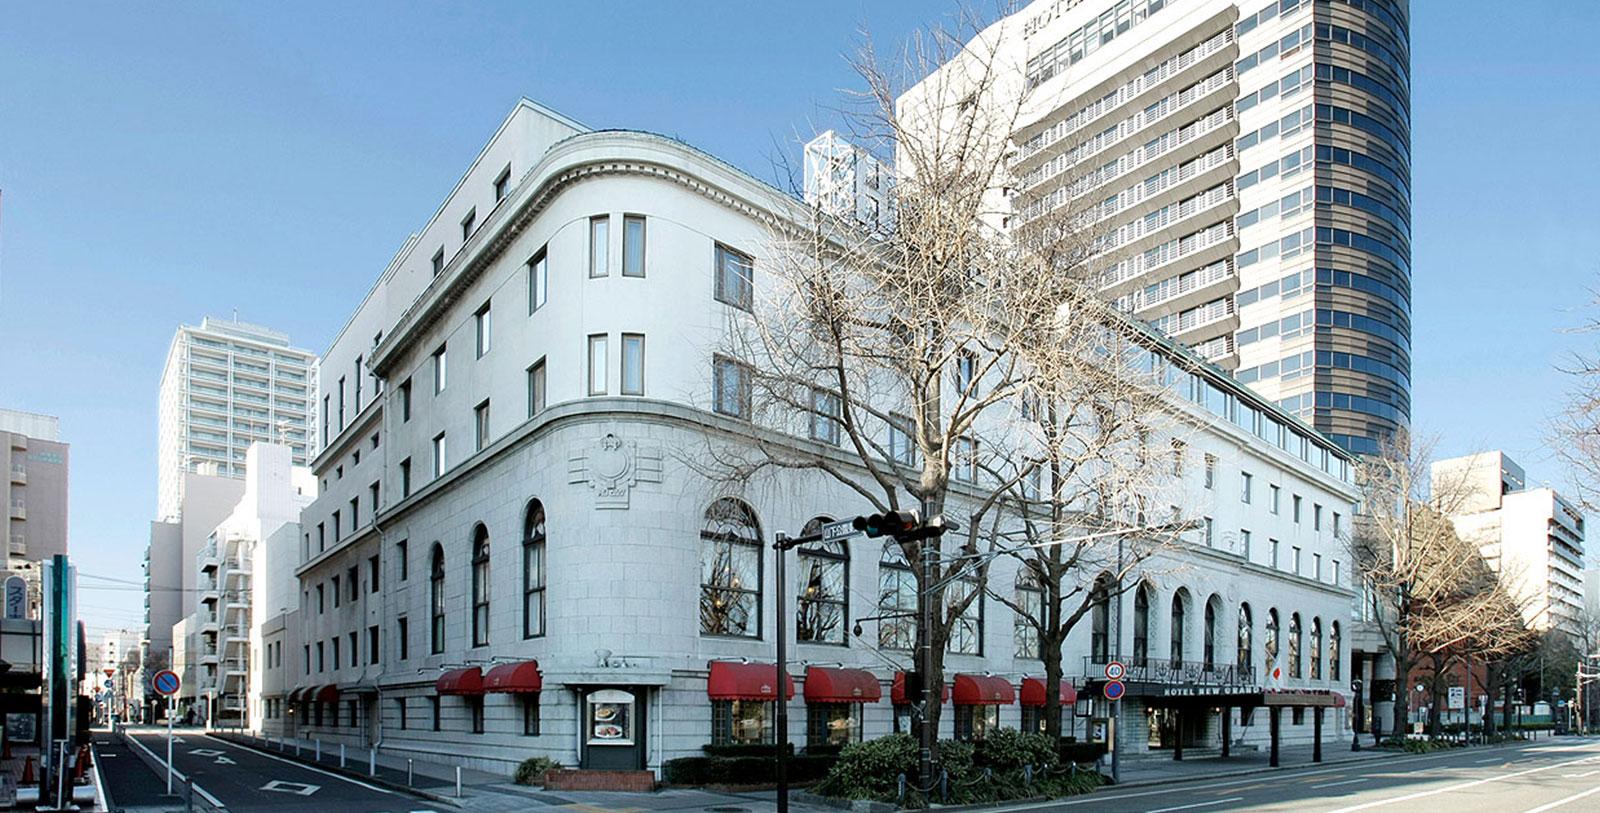 Image of Exterior, Hotel New Grand, Yokohama, Japan, 1927, Member of Historic Hotels Worldwide, Overview